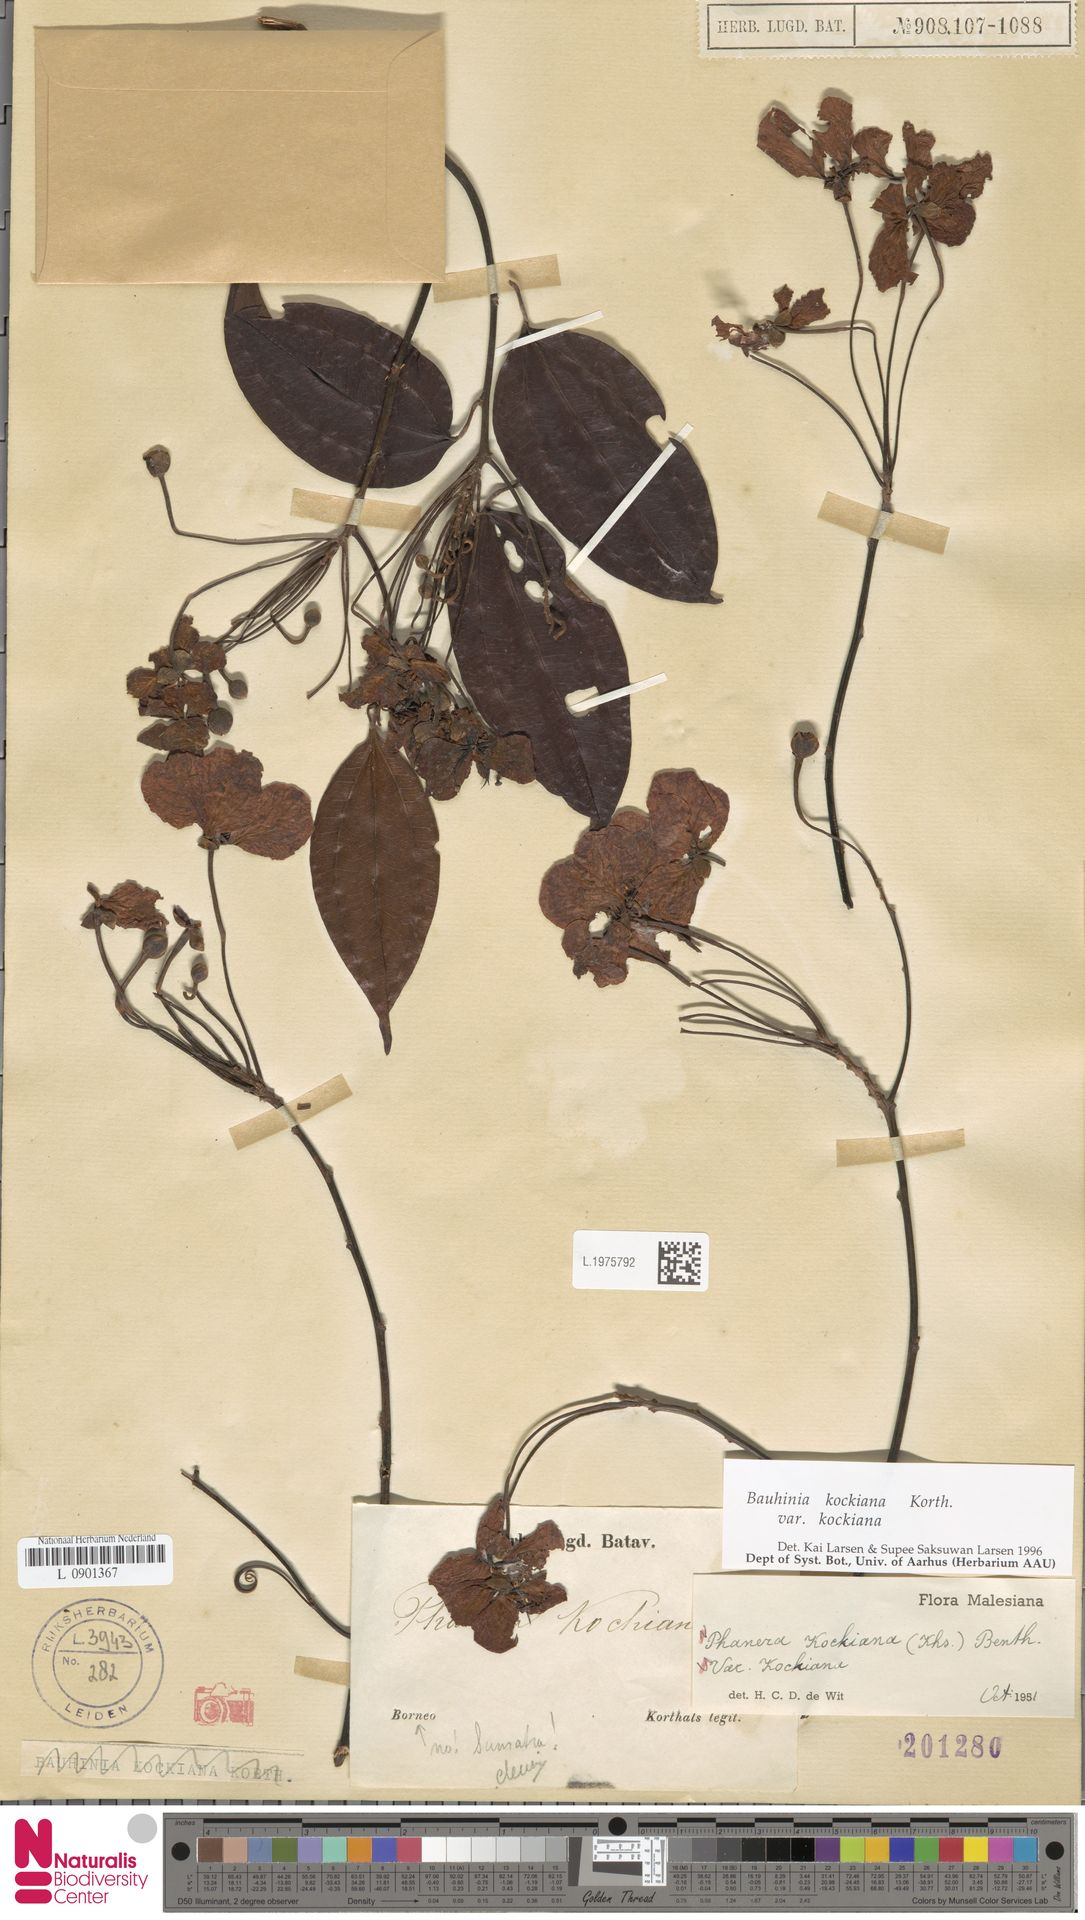 L.1975792 | Bauhinia kockiana var. kockiana